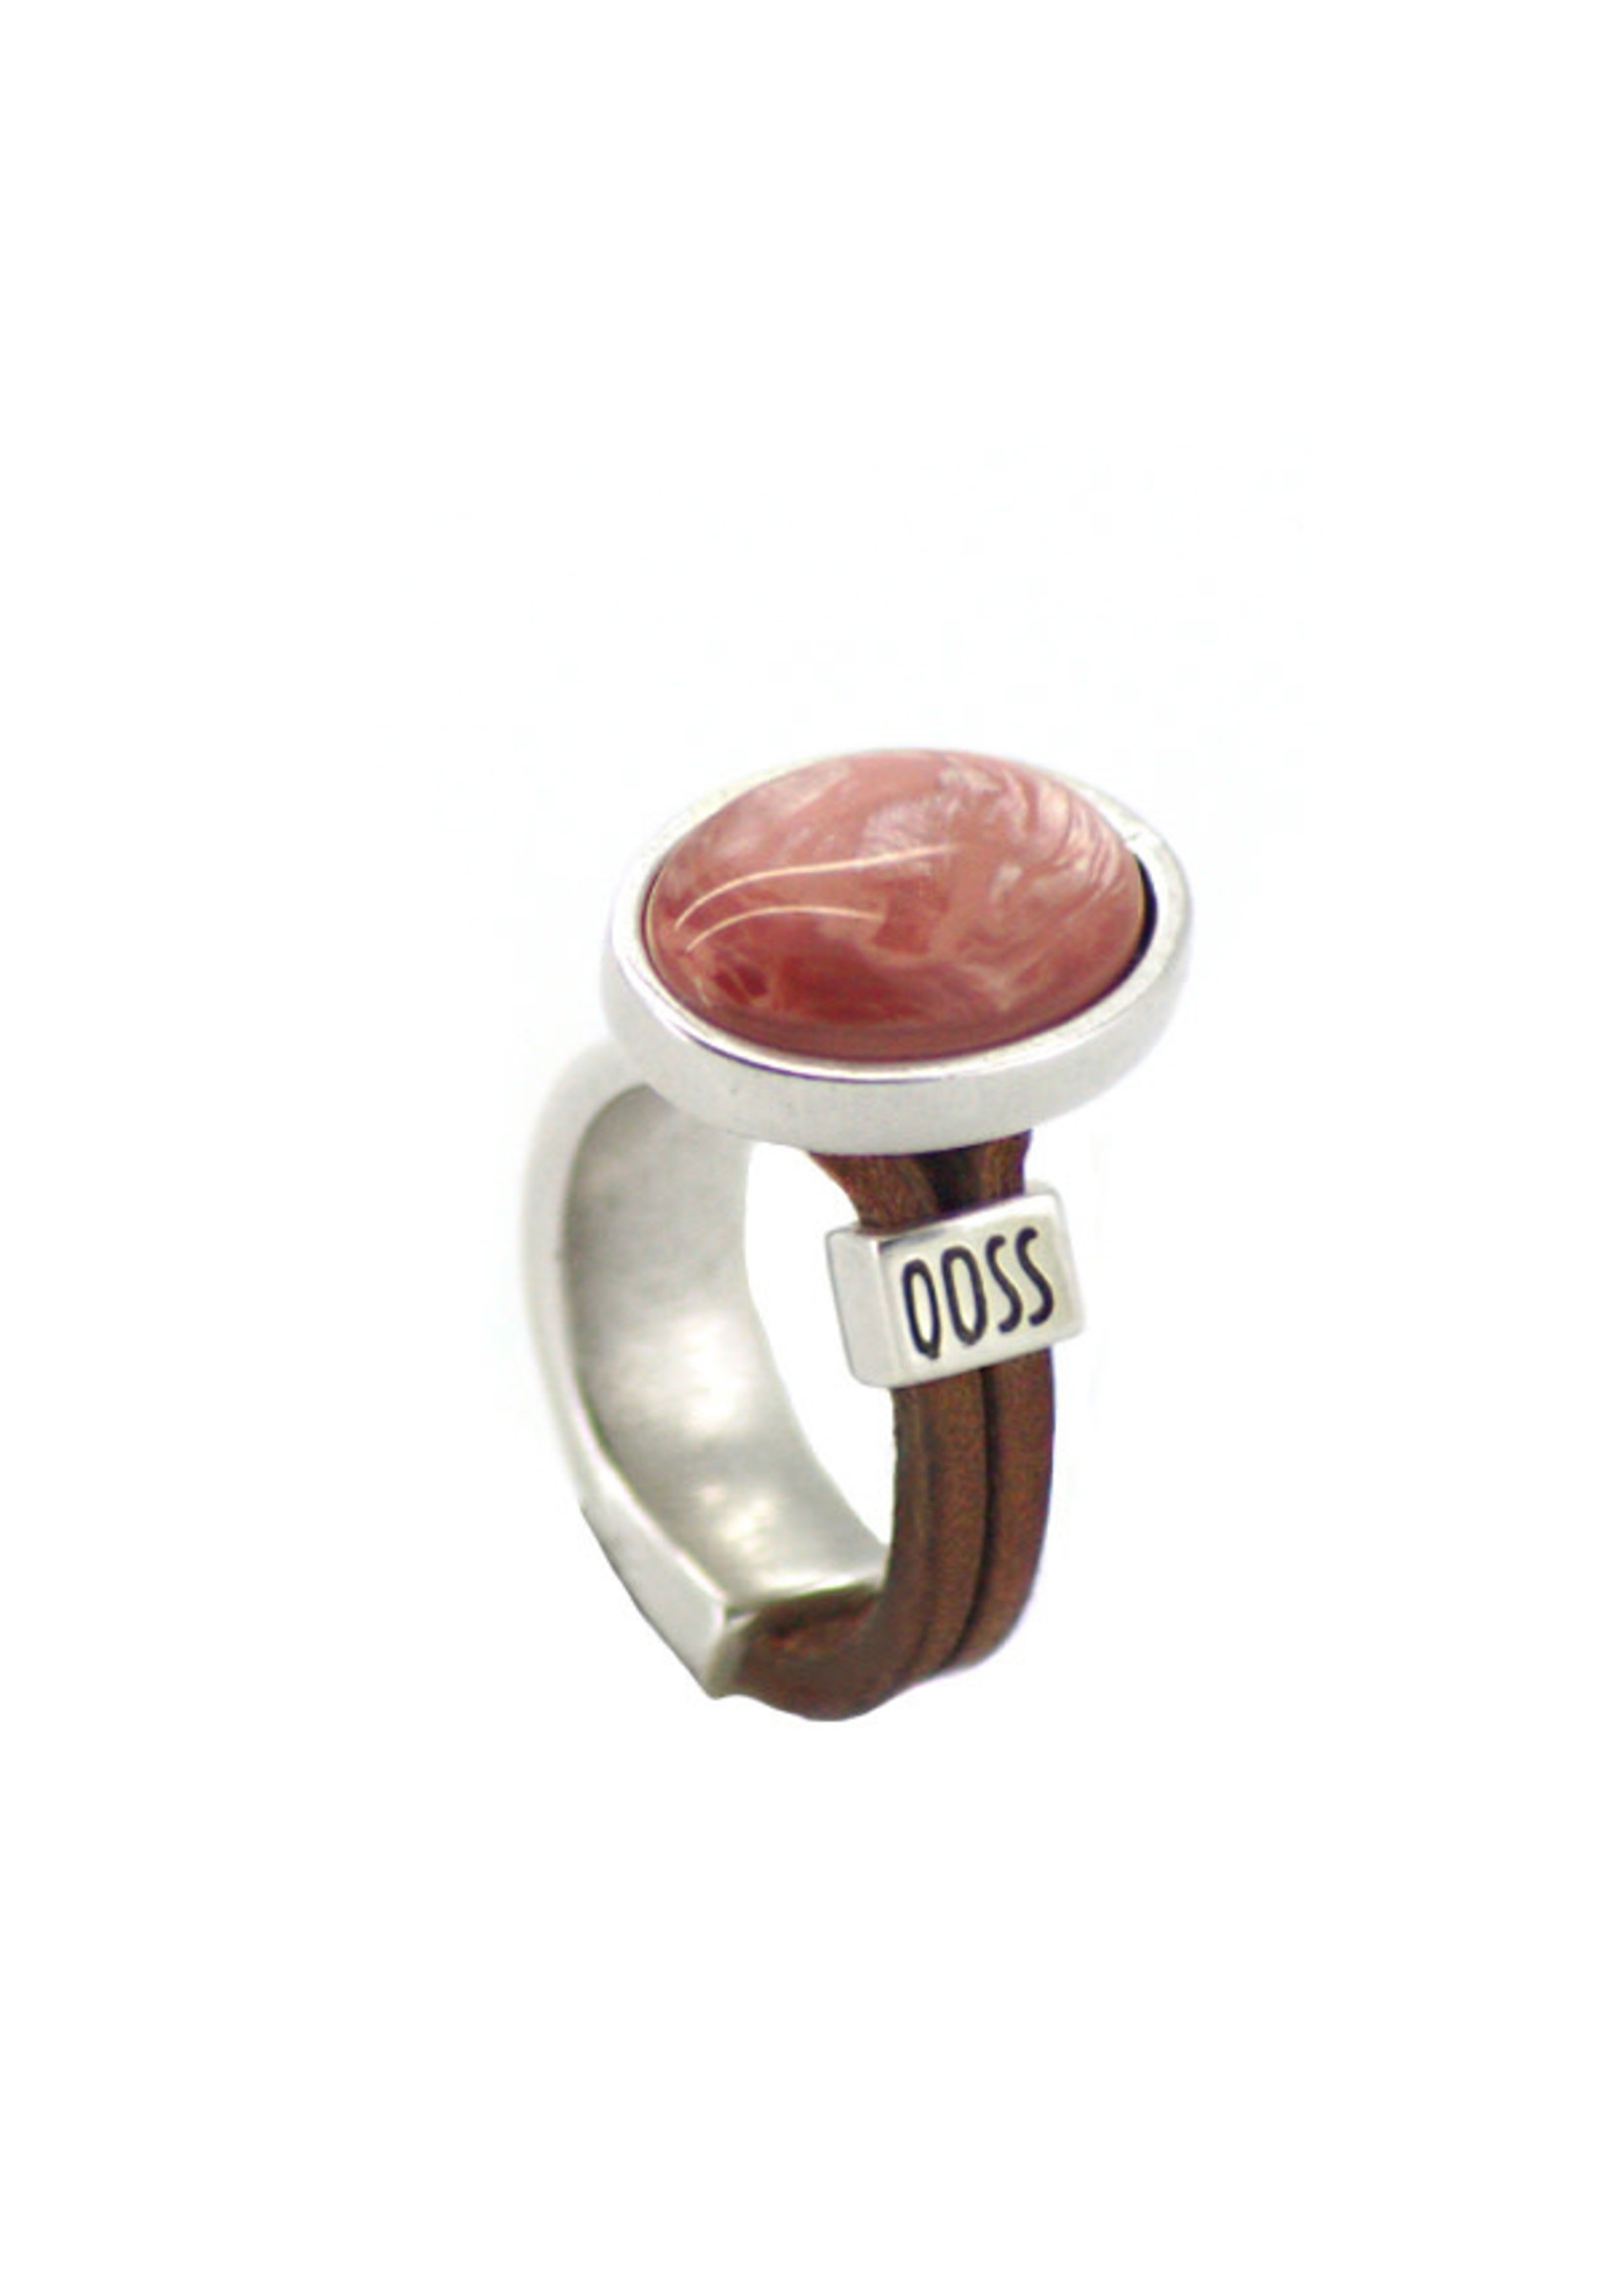 QOSS KAAT ring grijs-oud roze ovaal